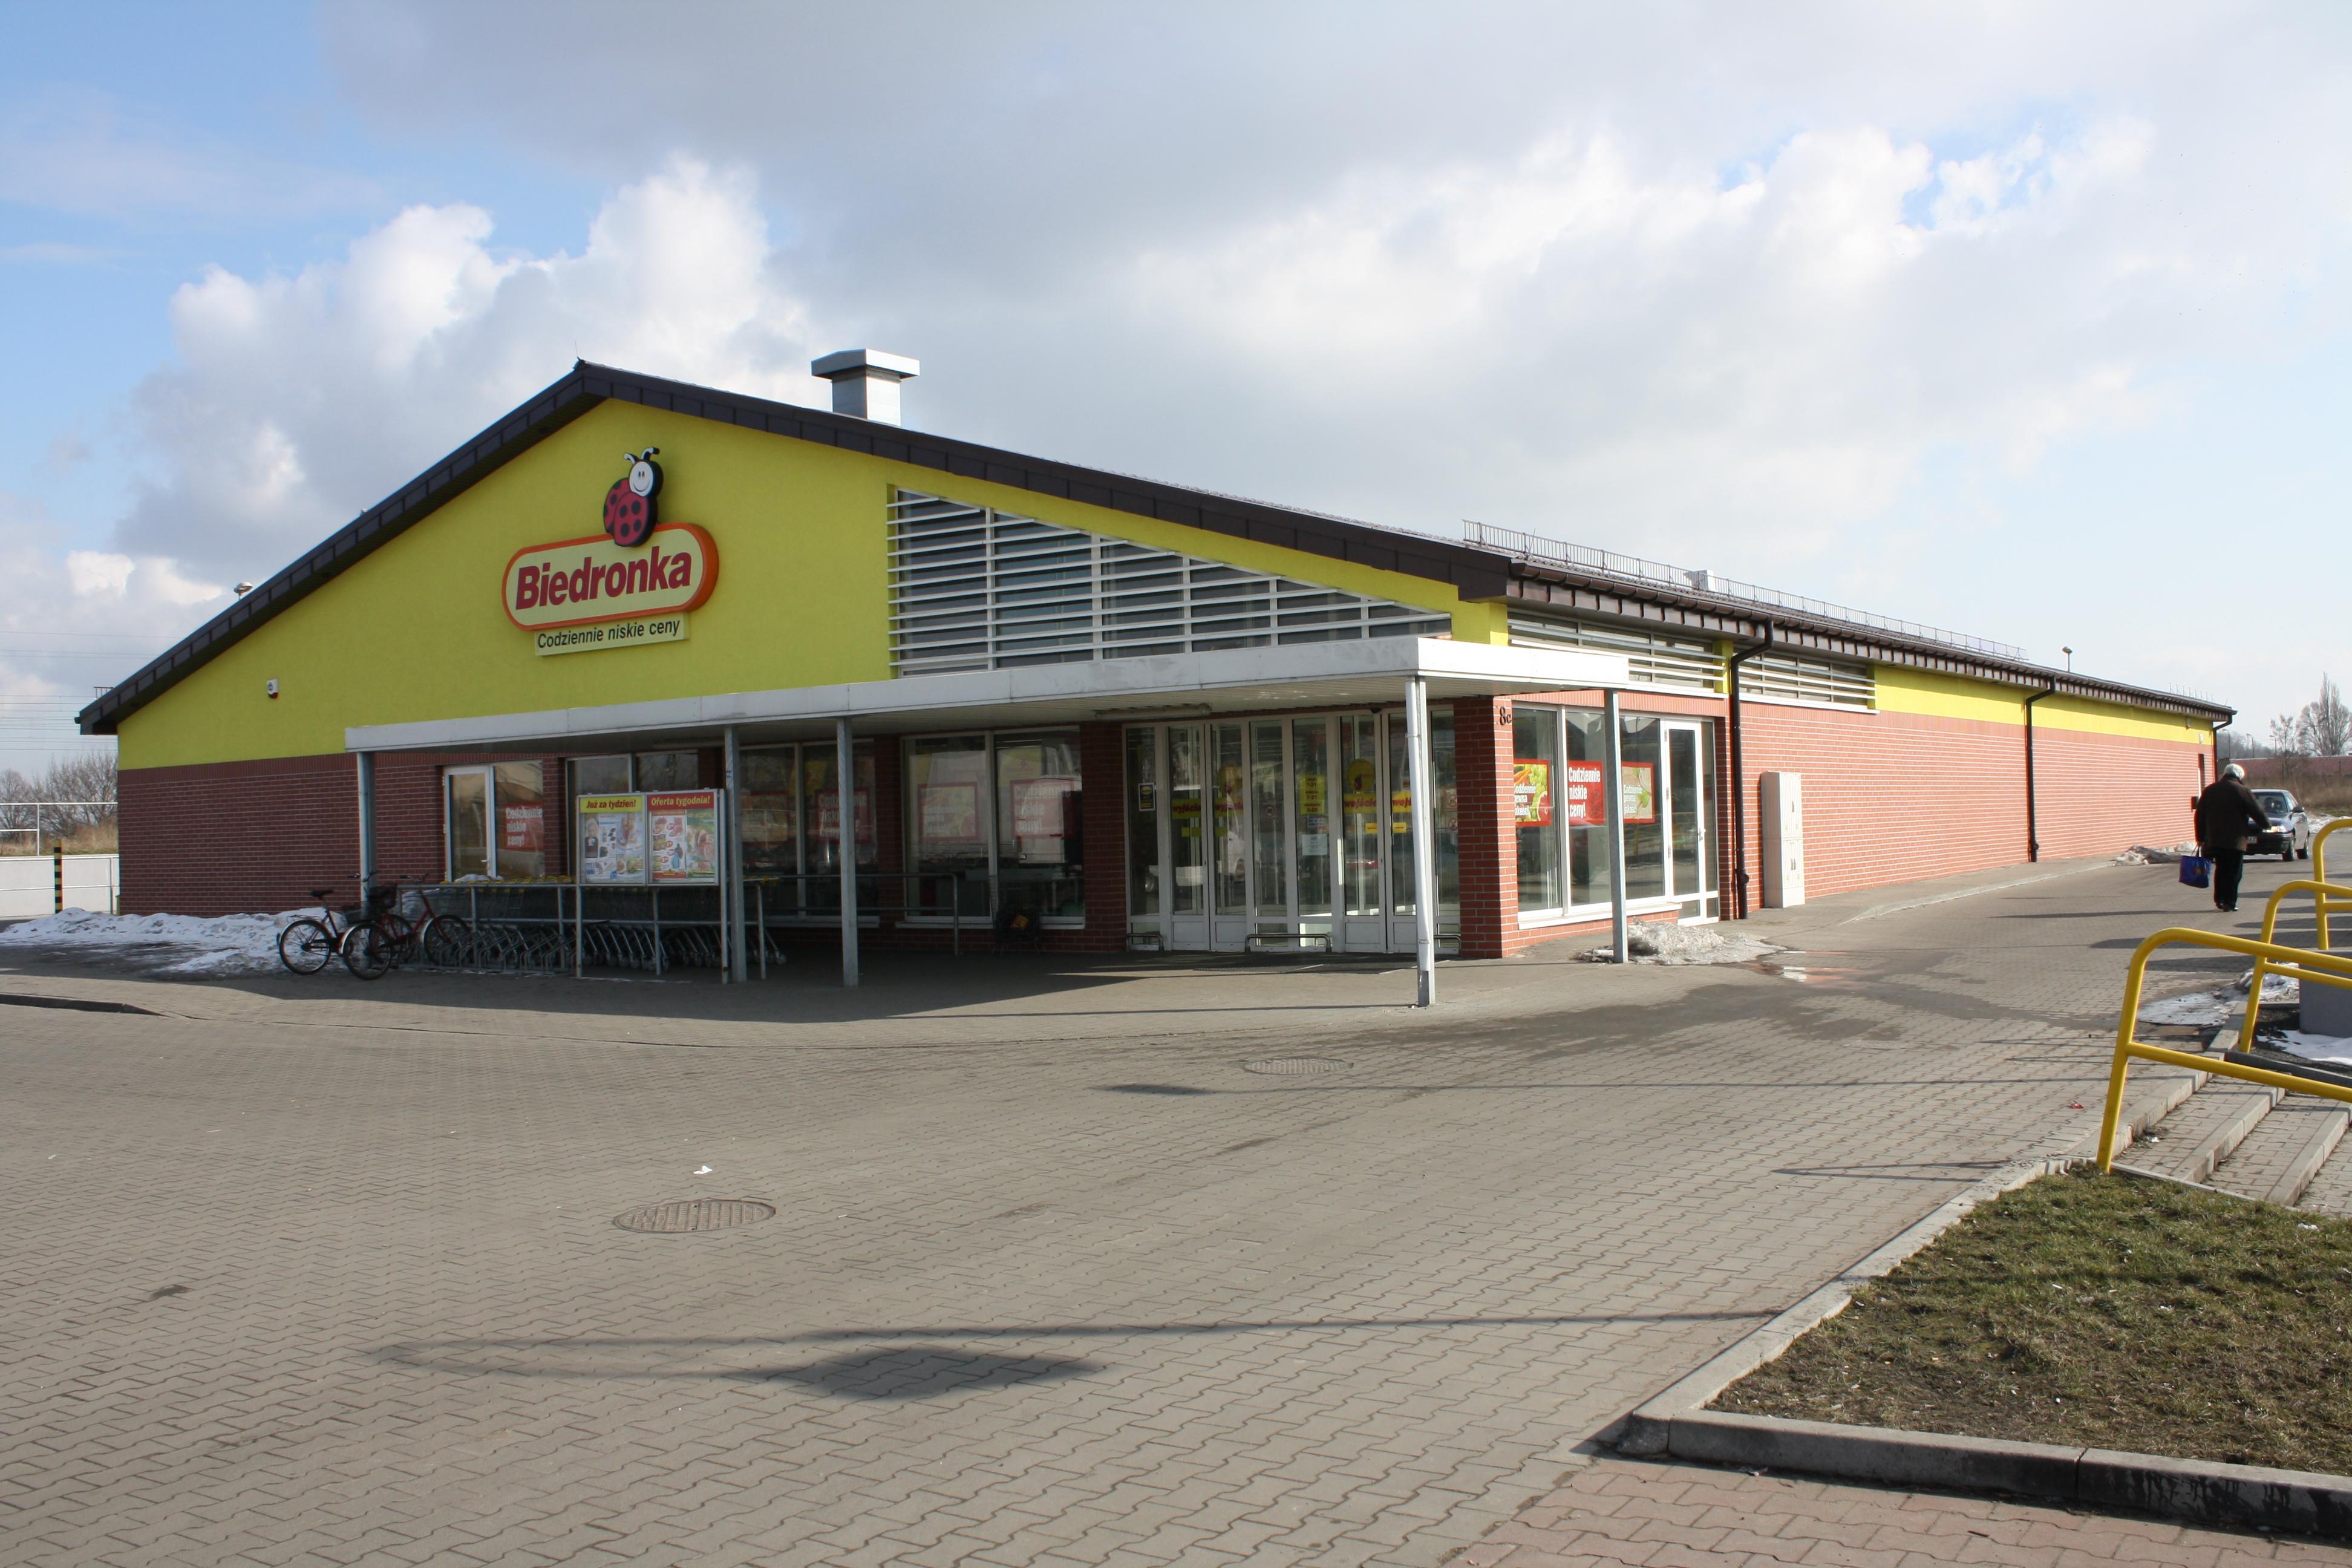 File Supermarket Biedronka In Aleksandrow Kujawski Jpg Wikimedia